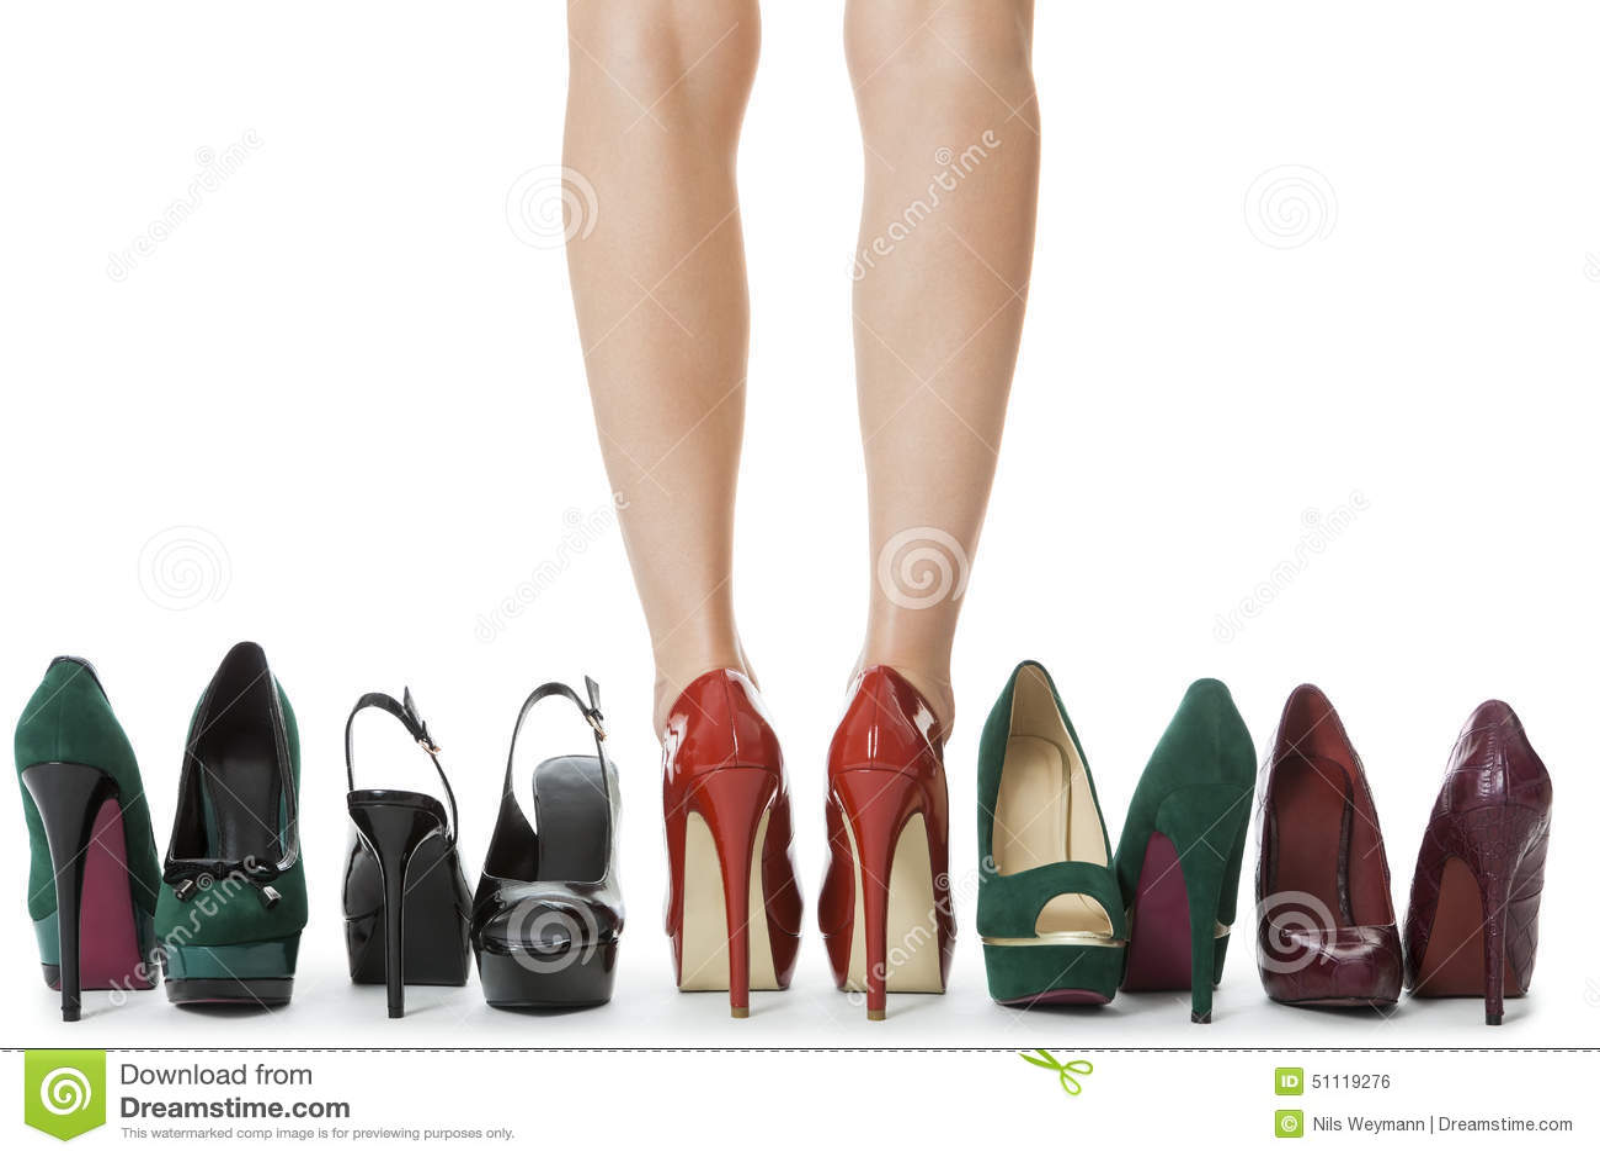 8cf65d6999 Κλείστε επάνω τα άψογα πόδια γυναικών στα στιλπνά κόκκινα υψηλά παπούτσια  τακουνιών που στέκονται μεταξύ άλλων κομψών υψηλών τακουνιών η ανασκόπηση  ...